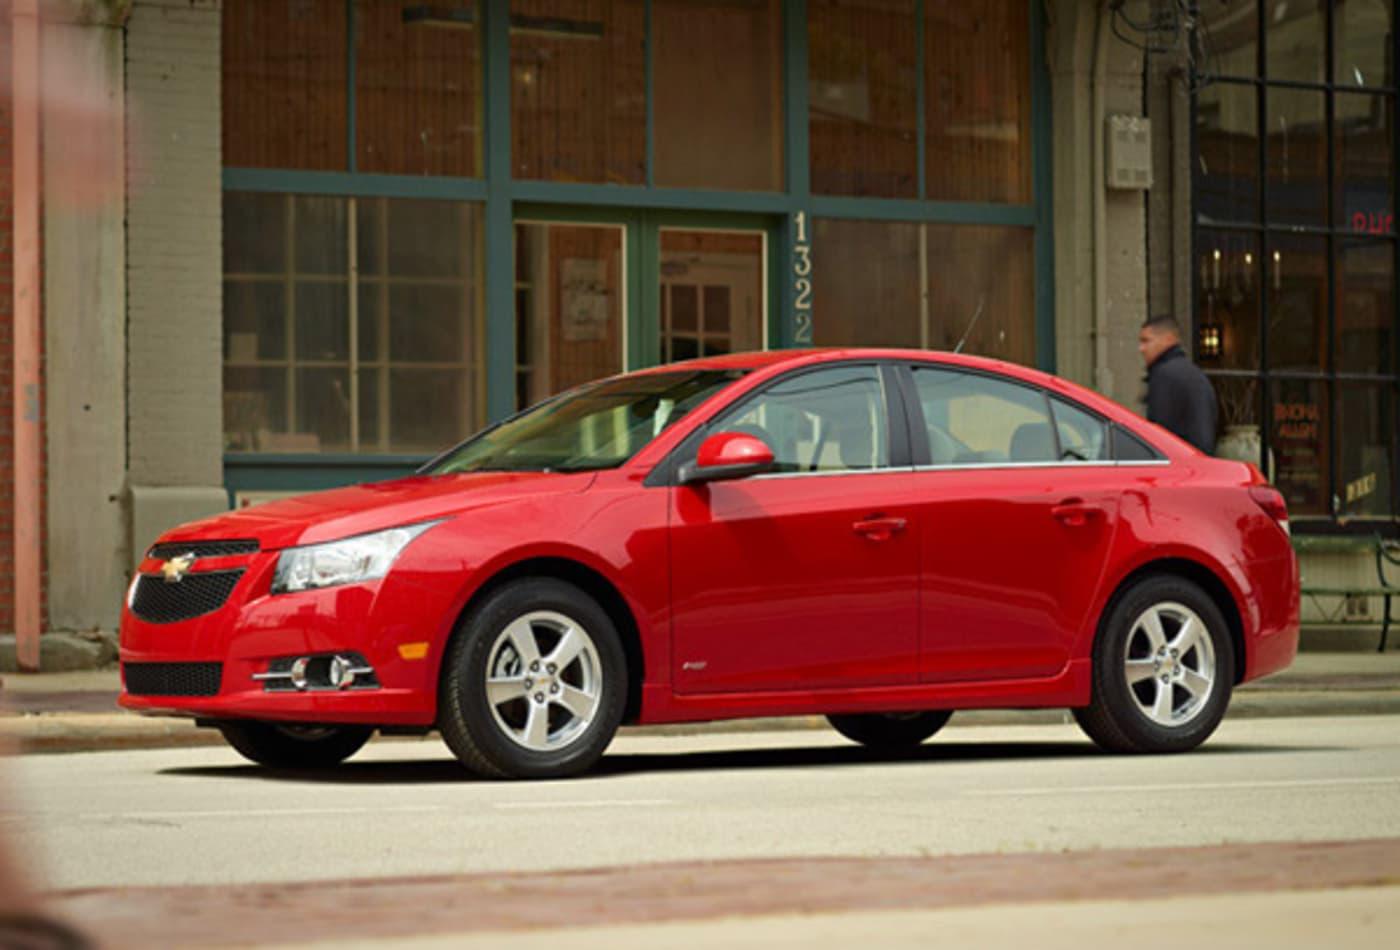 Chevrolet-Cruze-Best-Cars-Commuting-CNBC.jpg